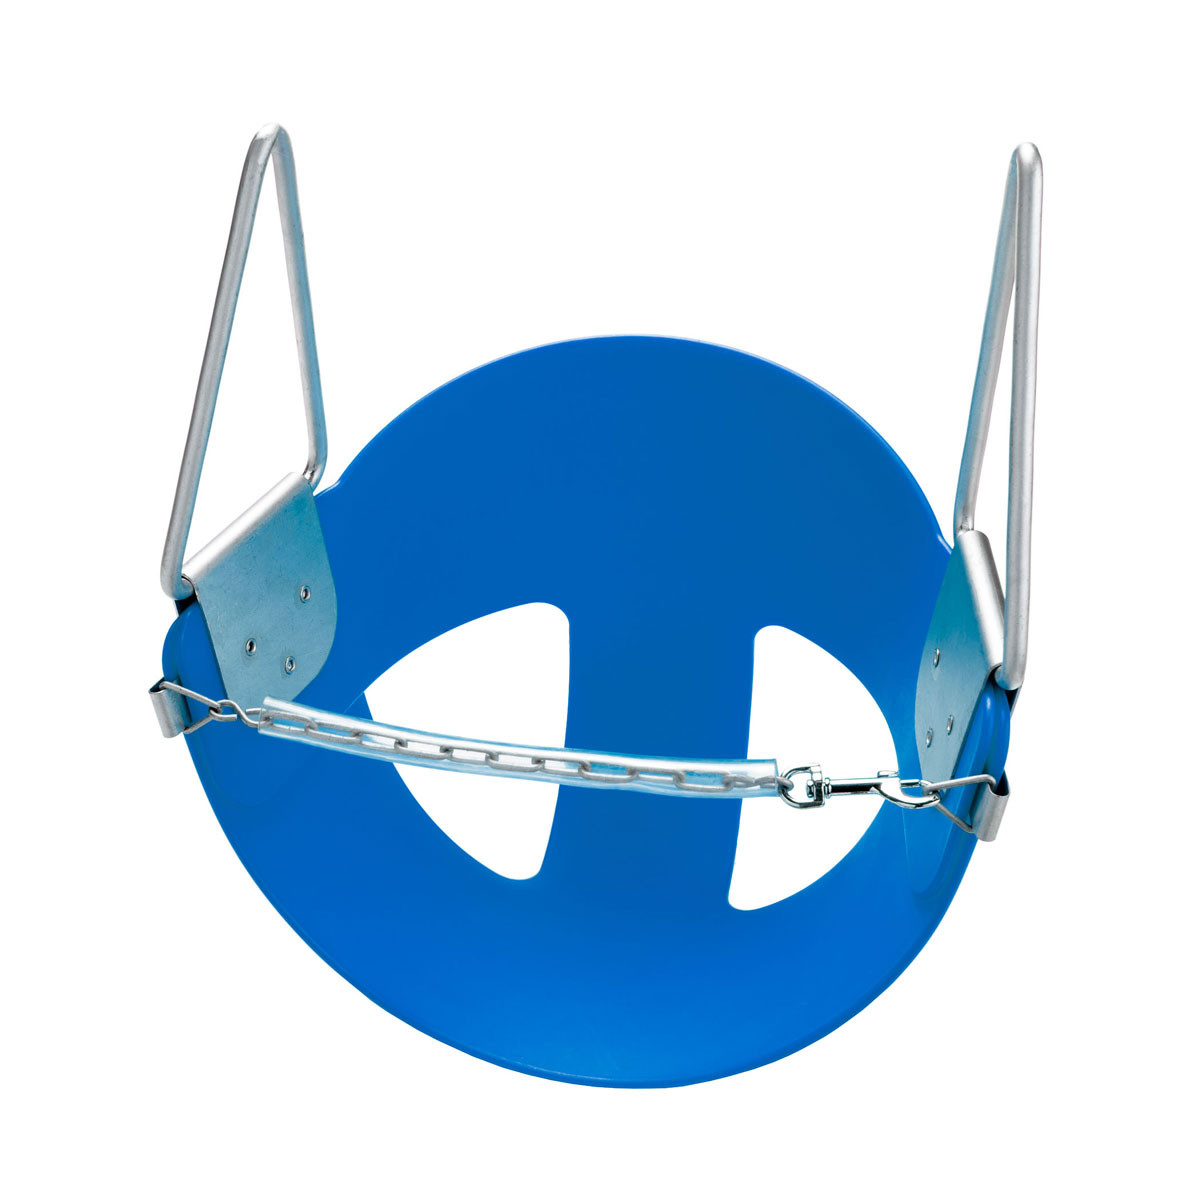 CoPoly Half Bucket Swing Seat - Blue